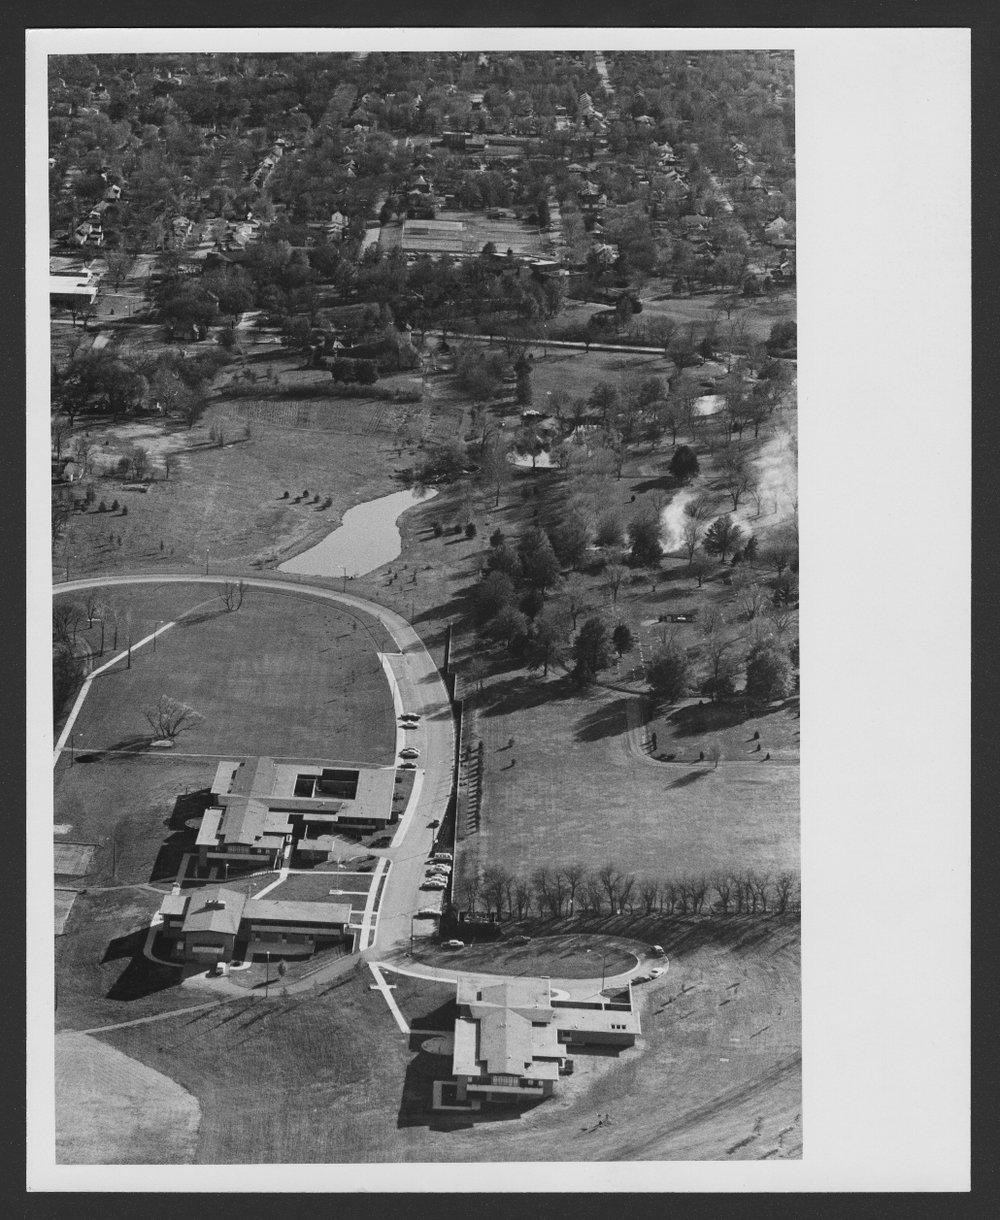 Aerial view of Menninger Clinic Children's Division in Topeka, Kansas